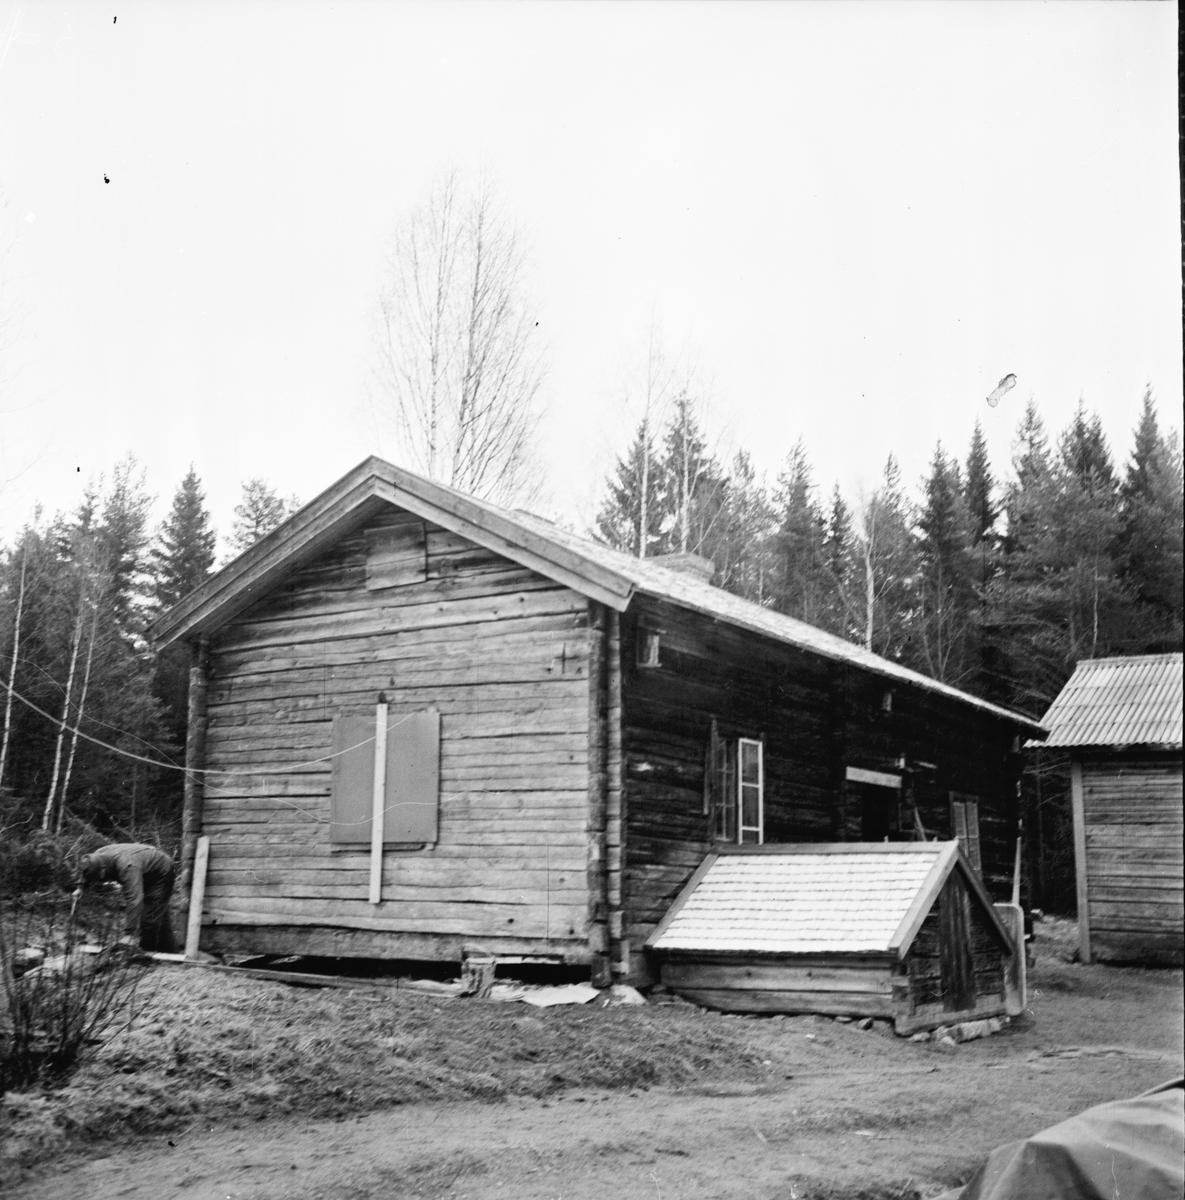 Dalsjön, Gamla gården renoveras, kakelugn Jan 1973